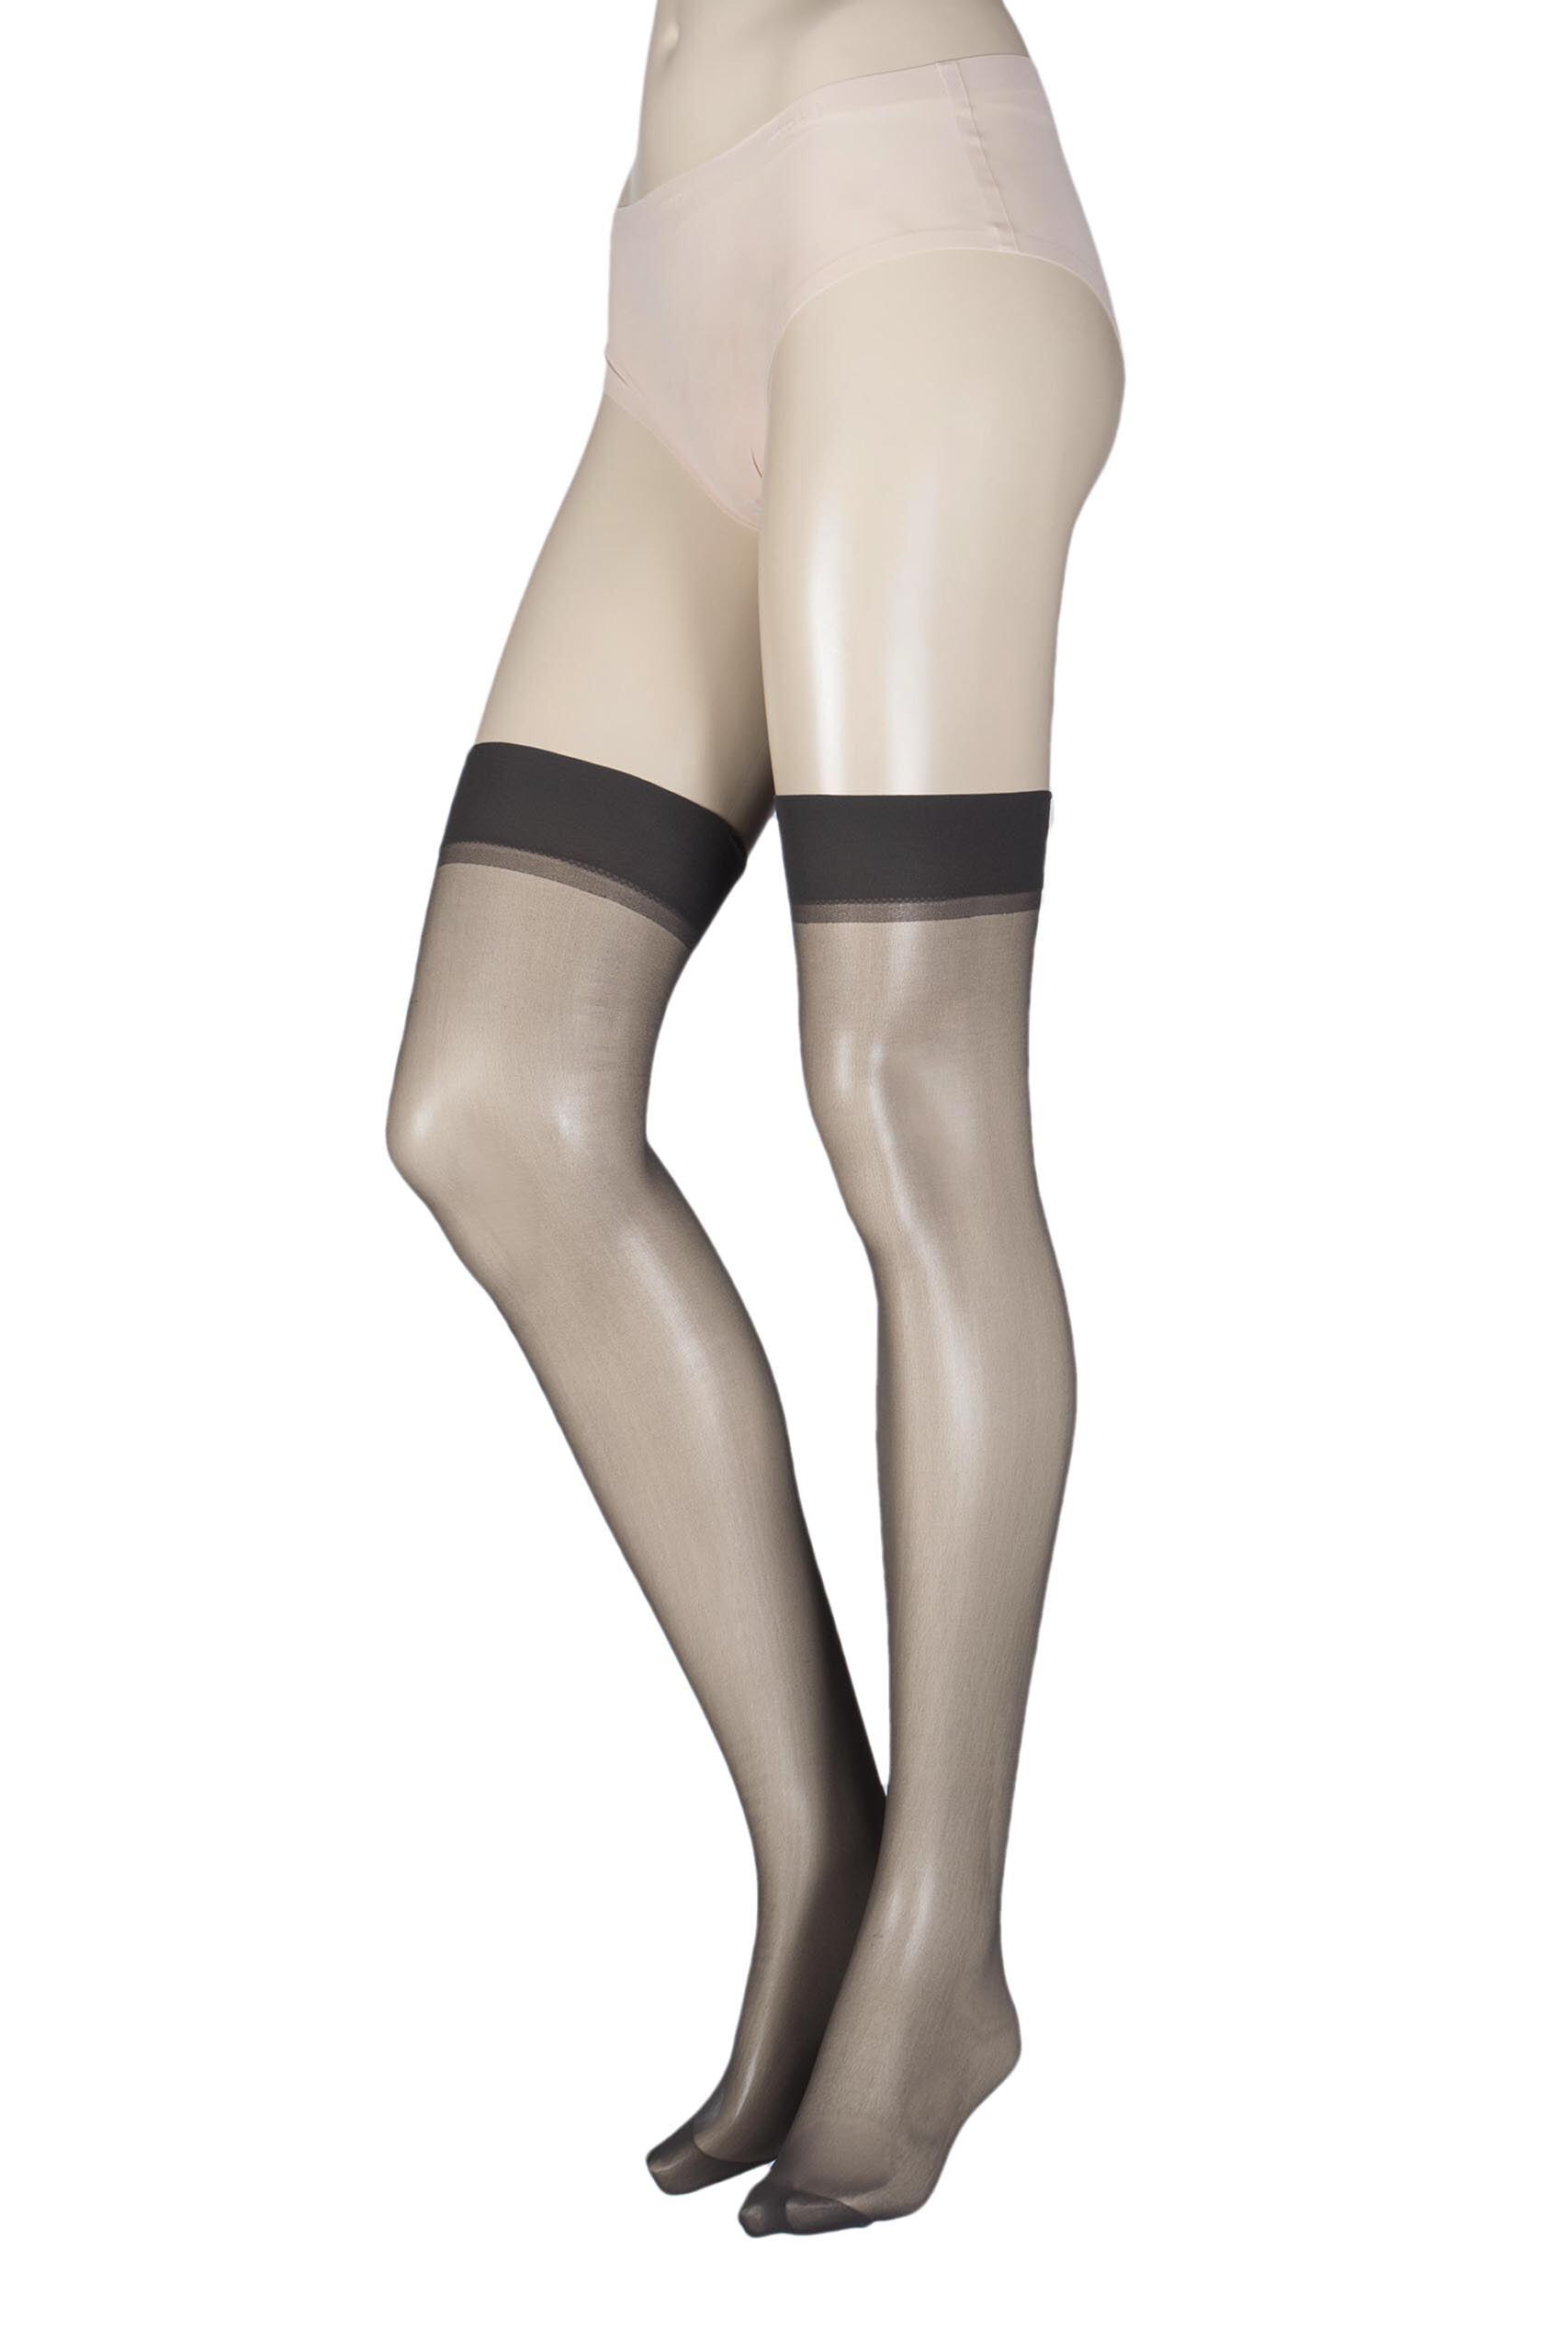 Image of 1 Pair Barely Black Stockings 15 Denier 100% Nylon Ladies One Size - Elle